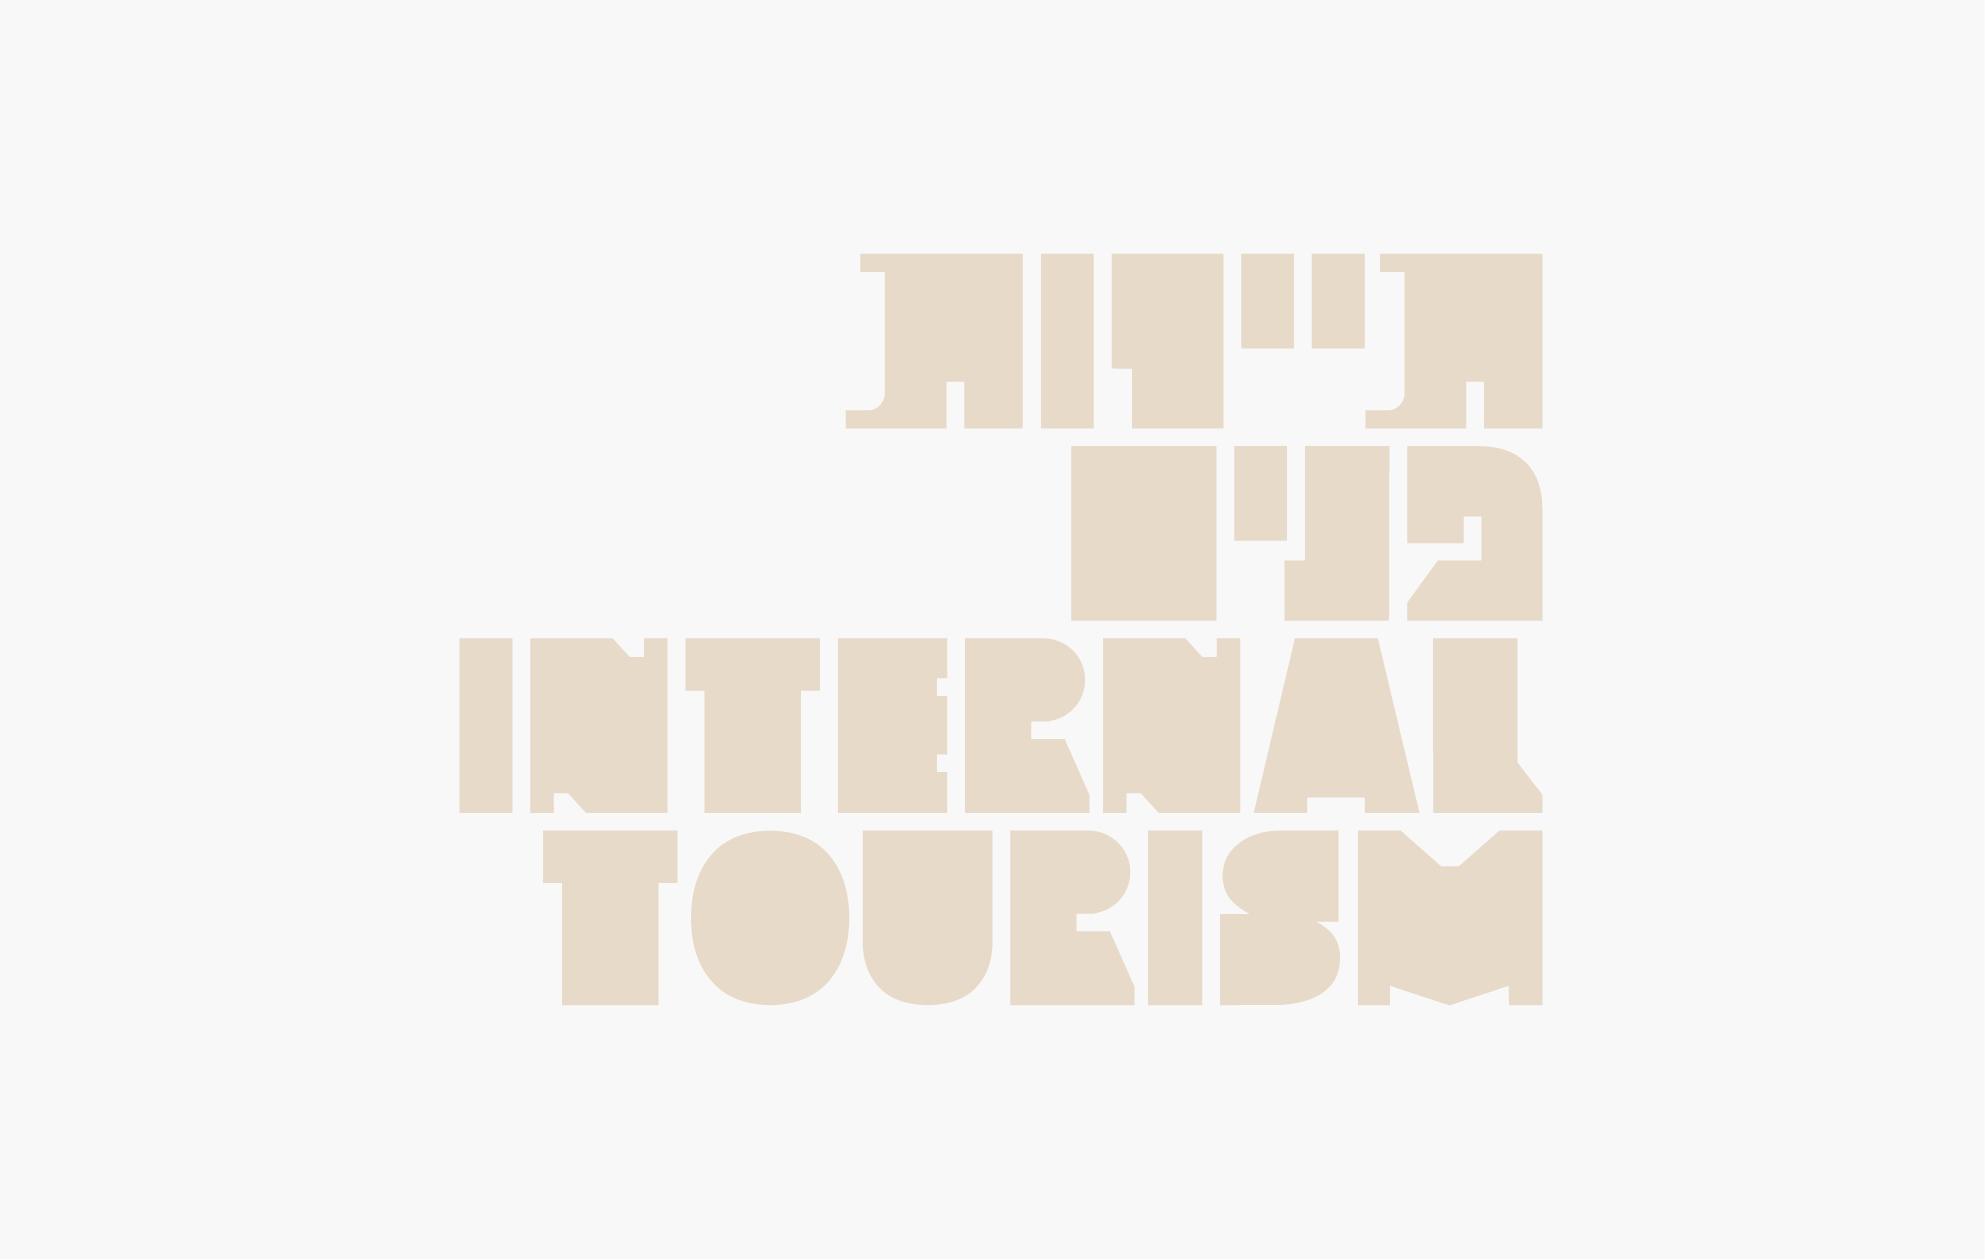 INTERNAL TOURISM